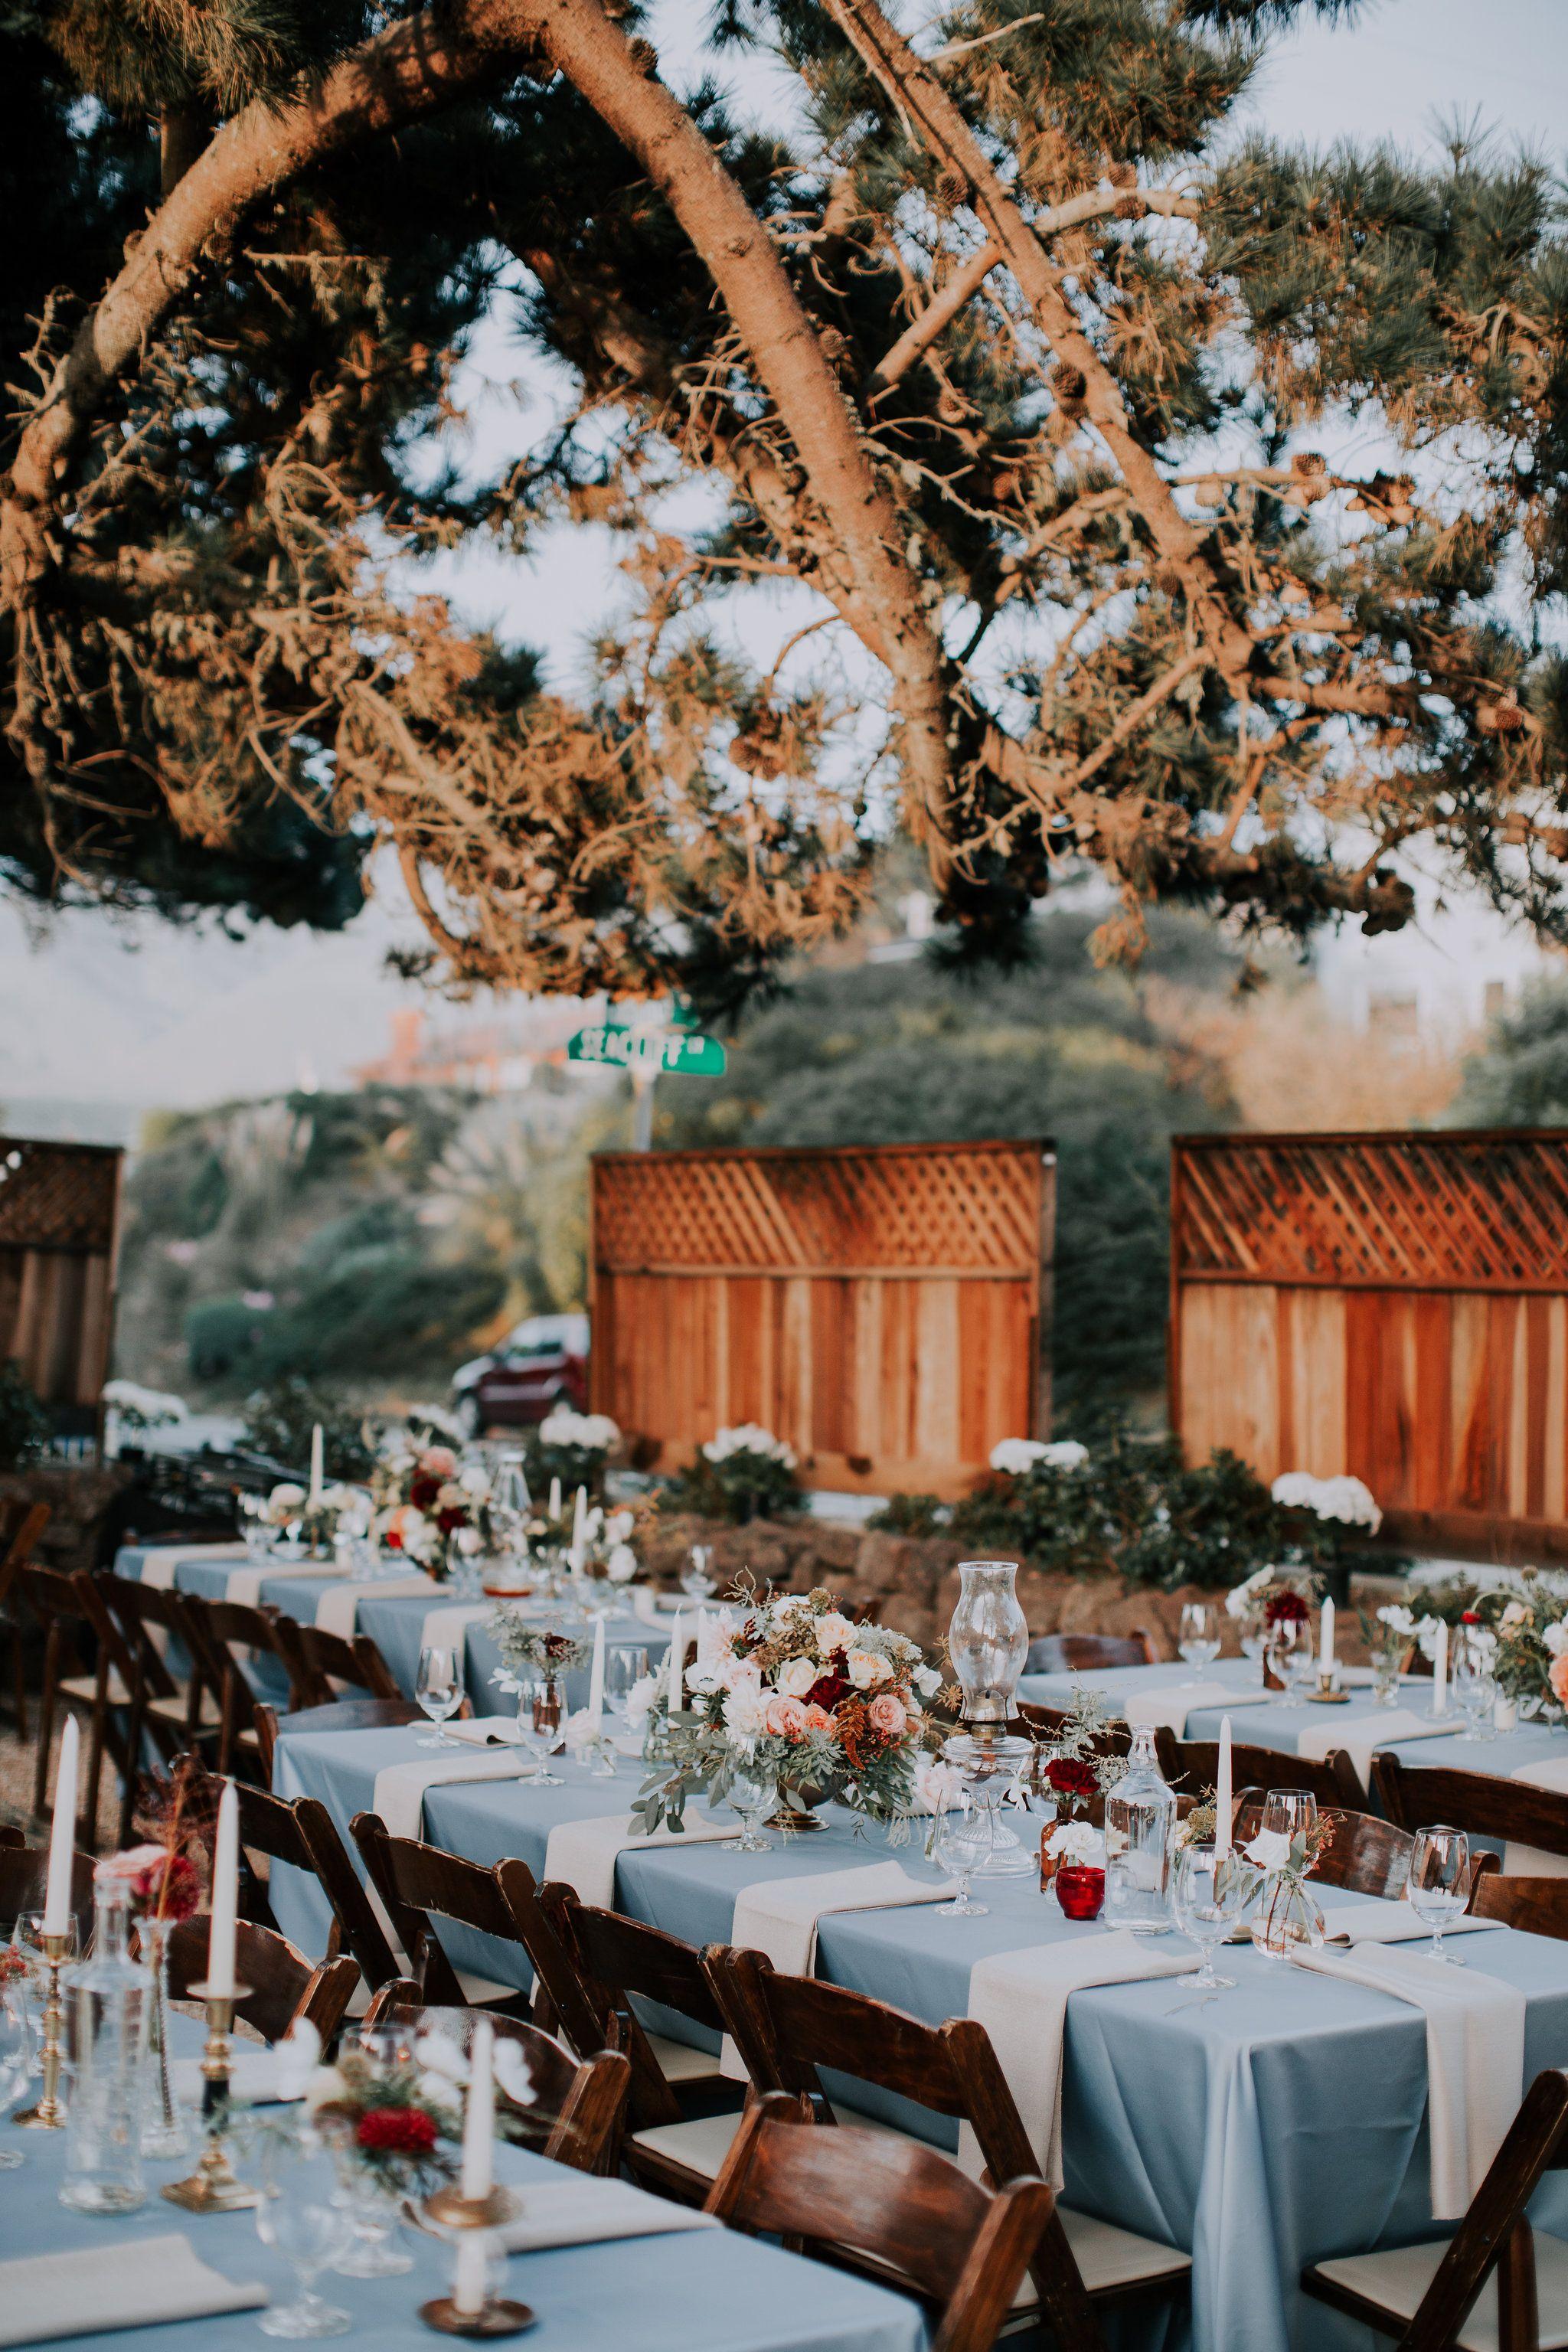 Vafa Photo Real Wedding Event Pros Wedding Rentals Chair Rentals Tabletop Rentals Table Rentals San Francisco Bay Area Event Rental Wedding Rentals